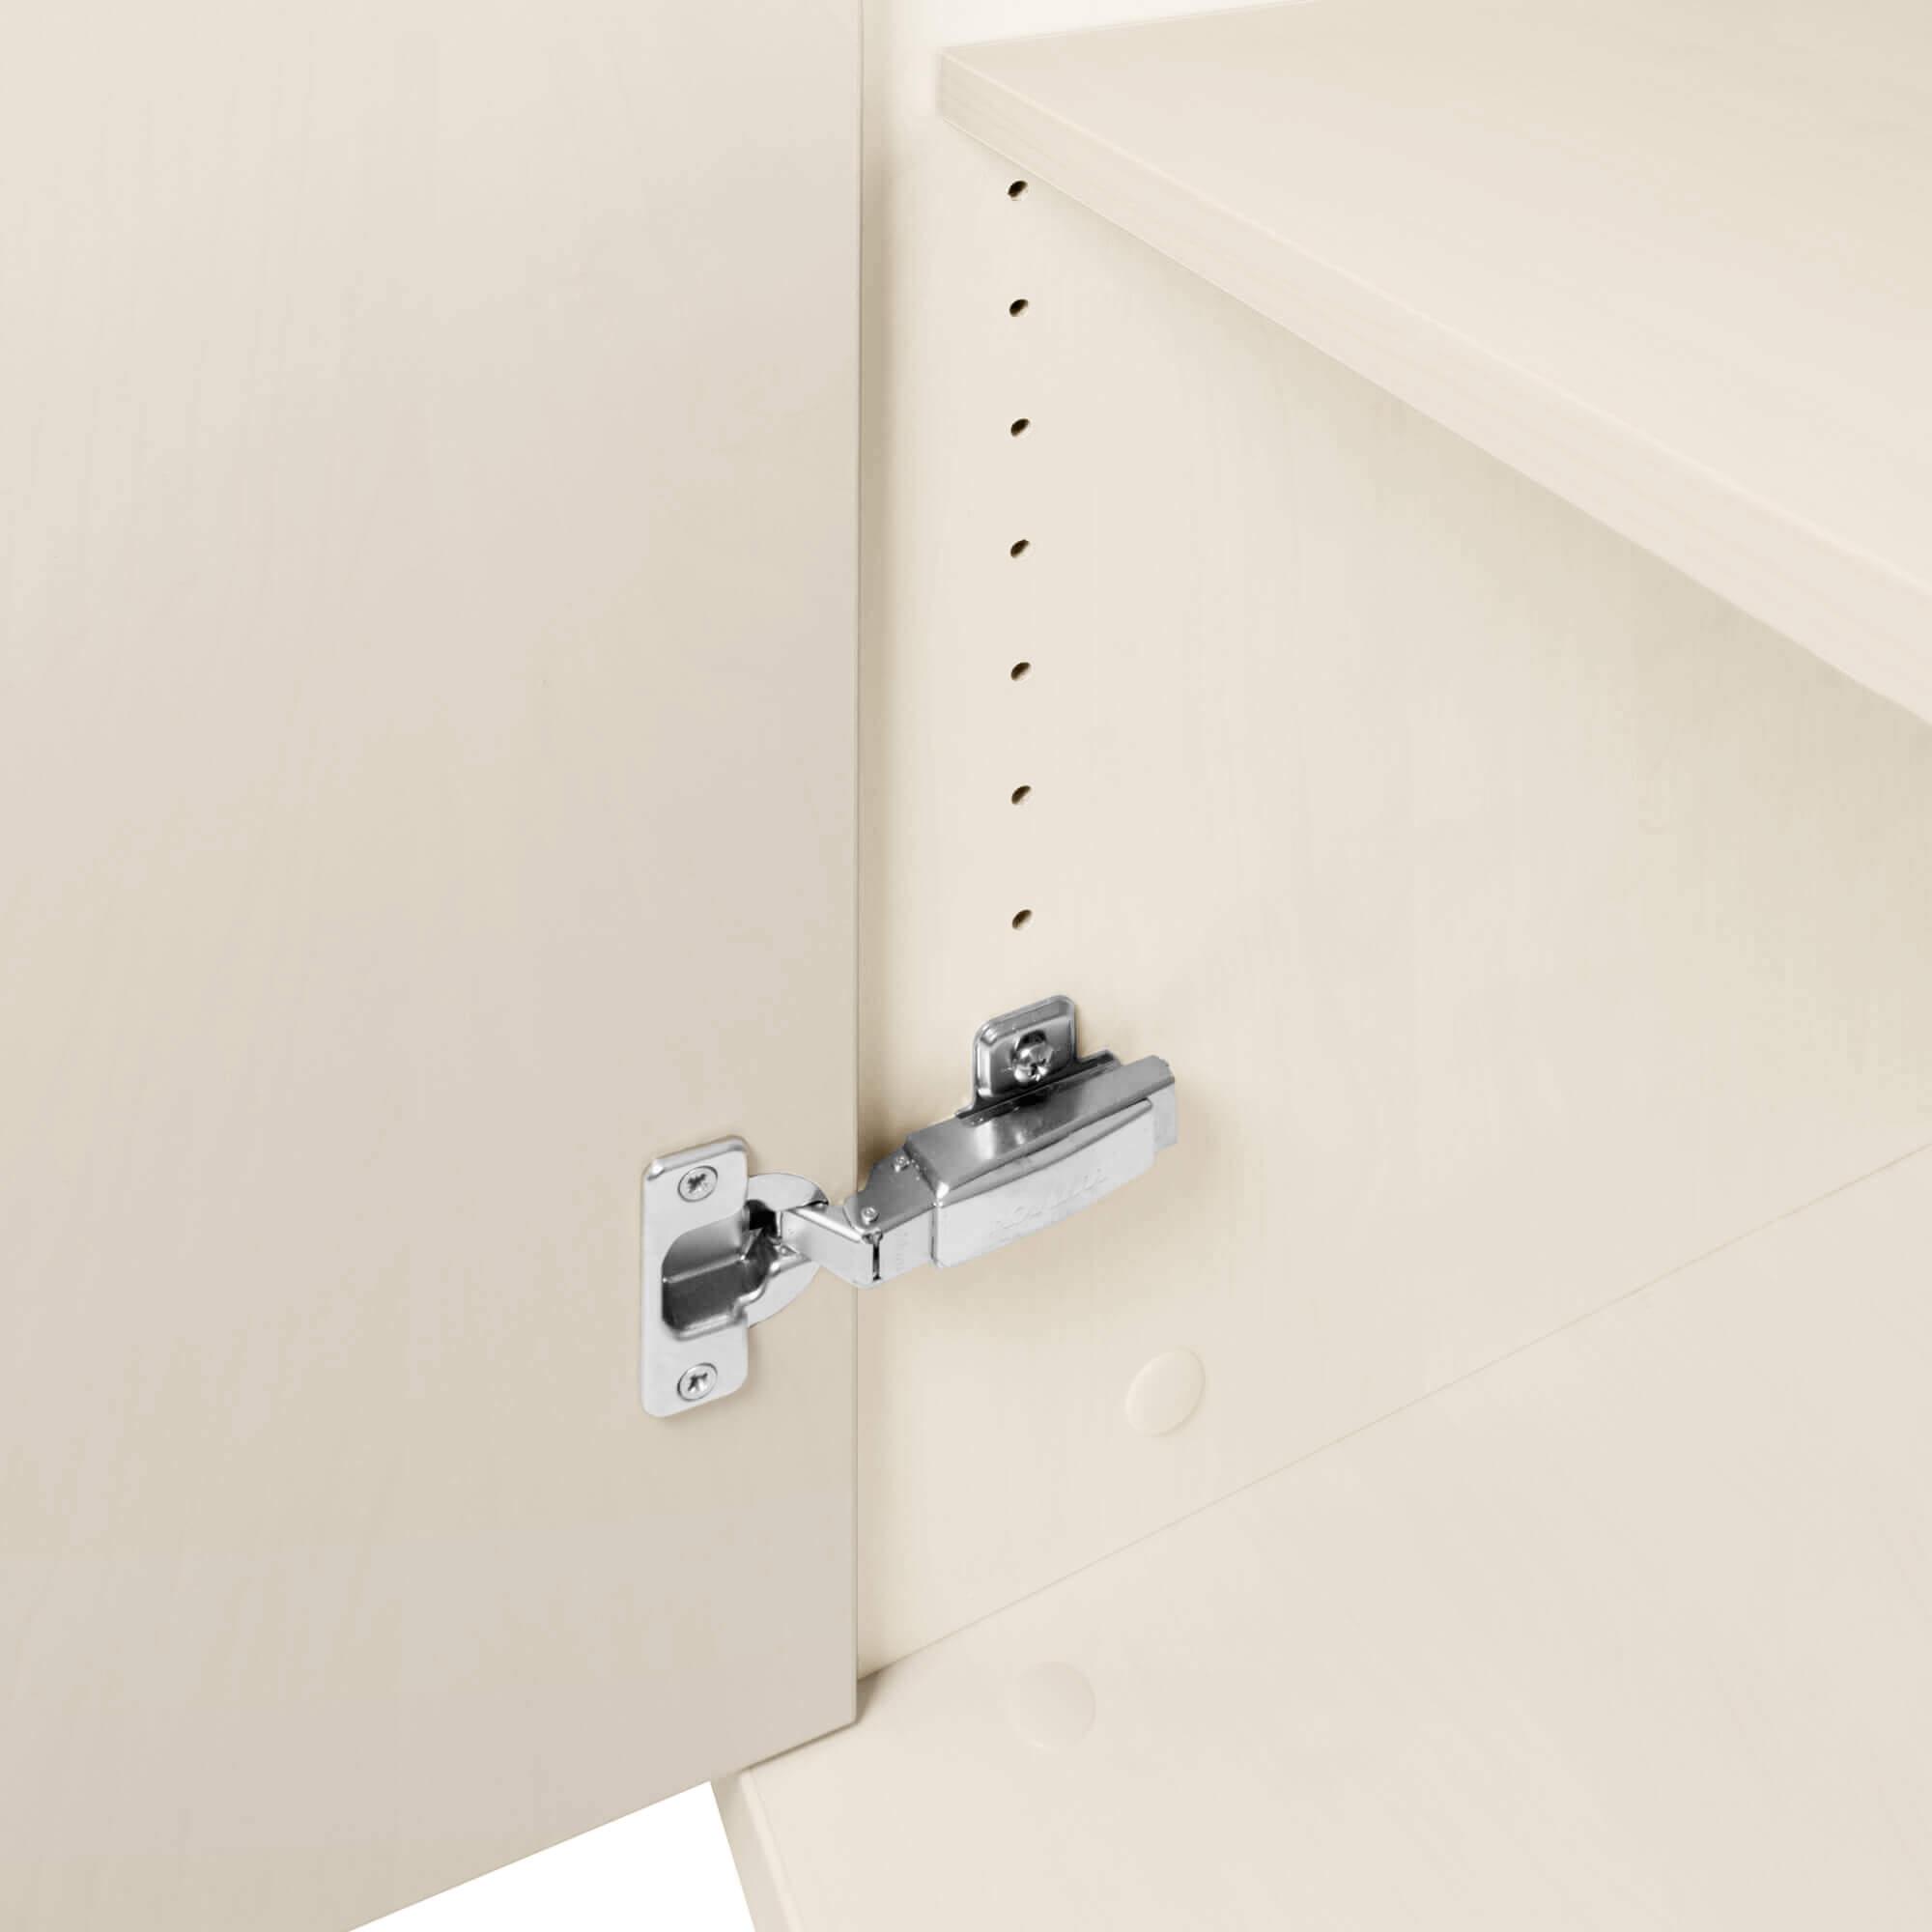 UNI Aktenschrank abschließbar 2OH Ahorn Schrank Büroschrank Flügeltürenschrank